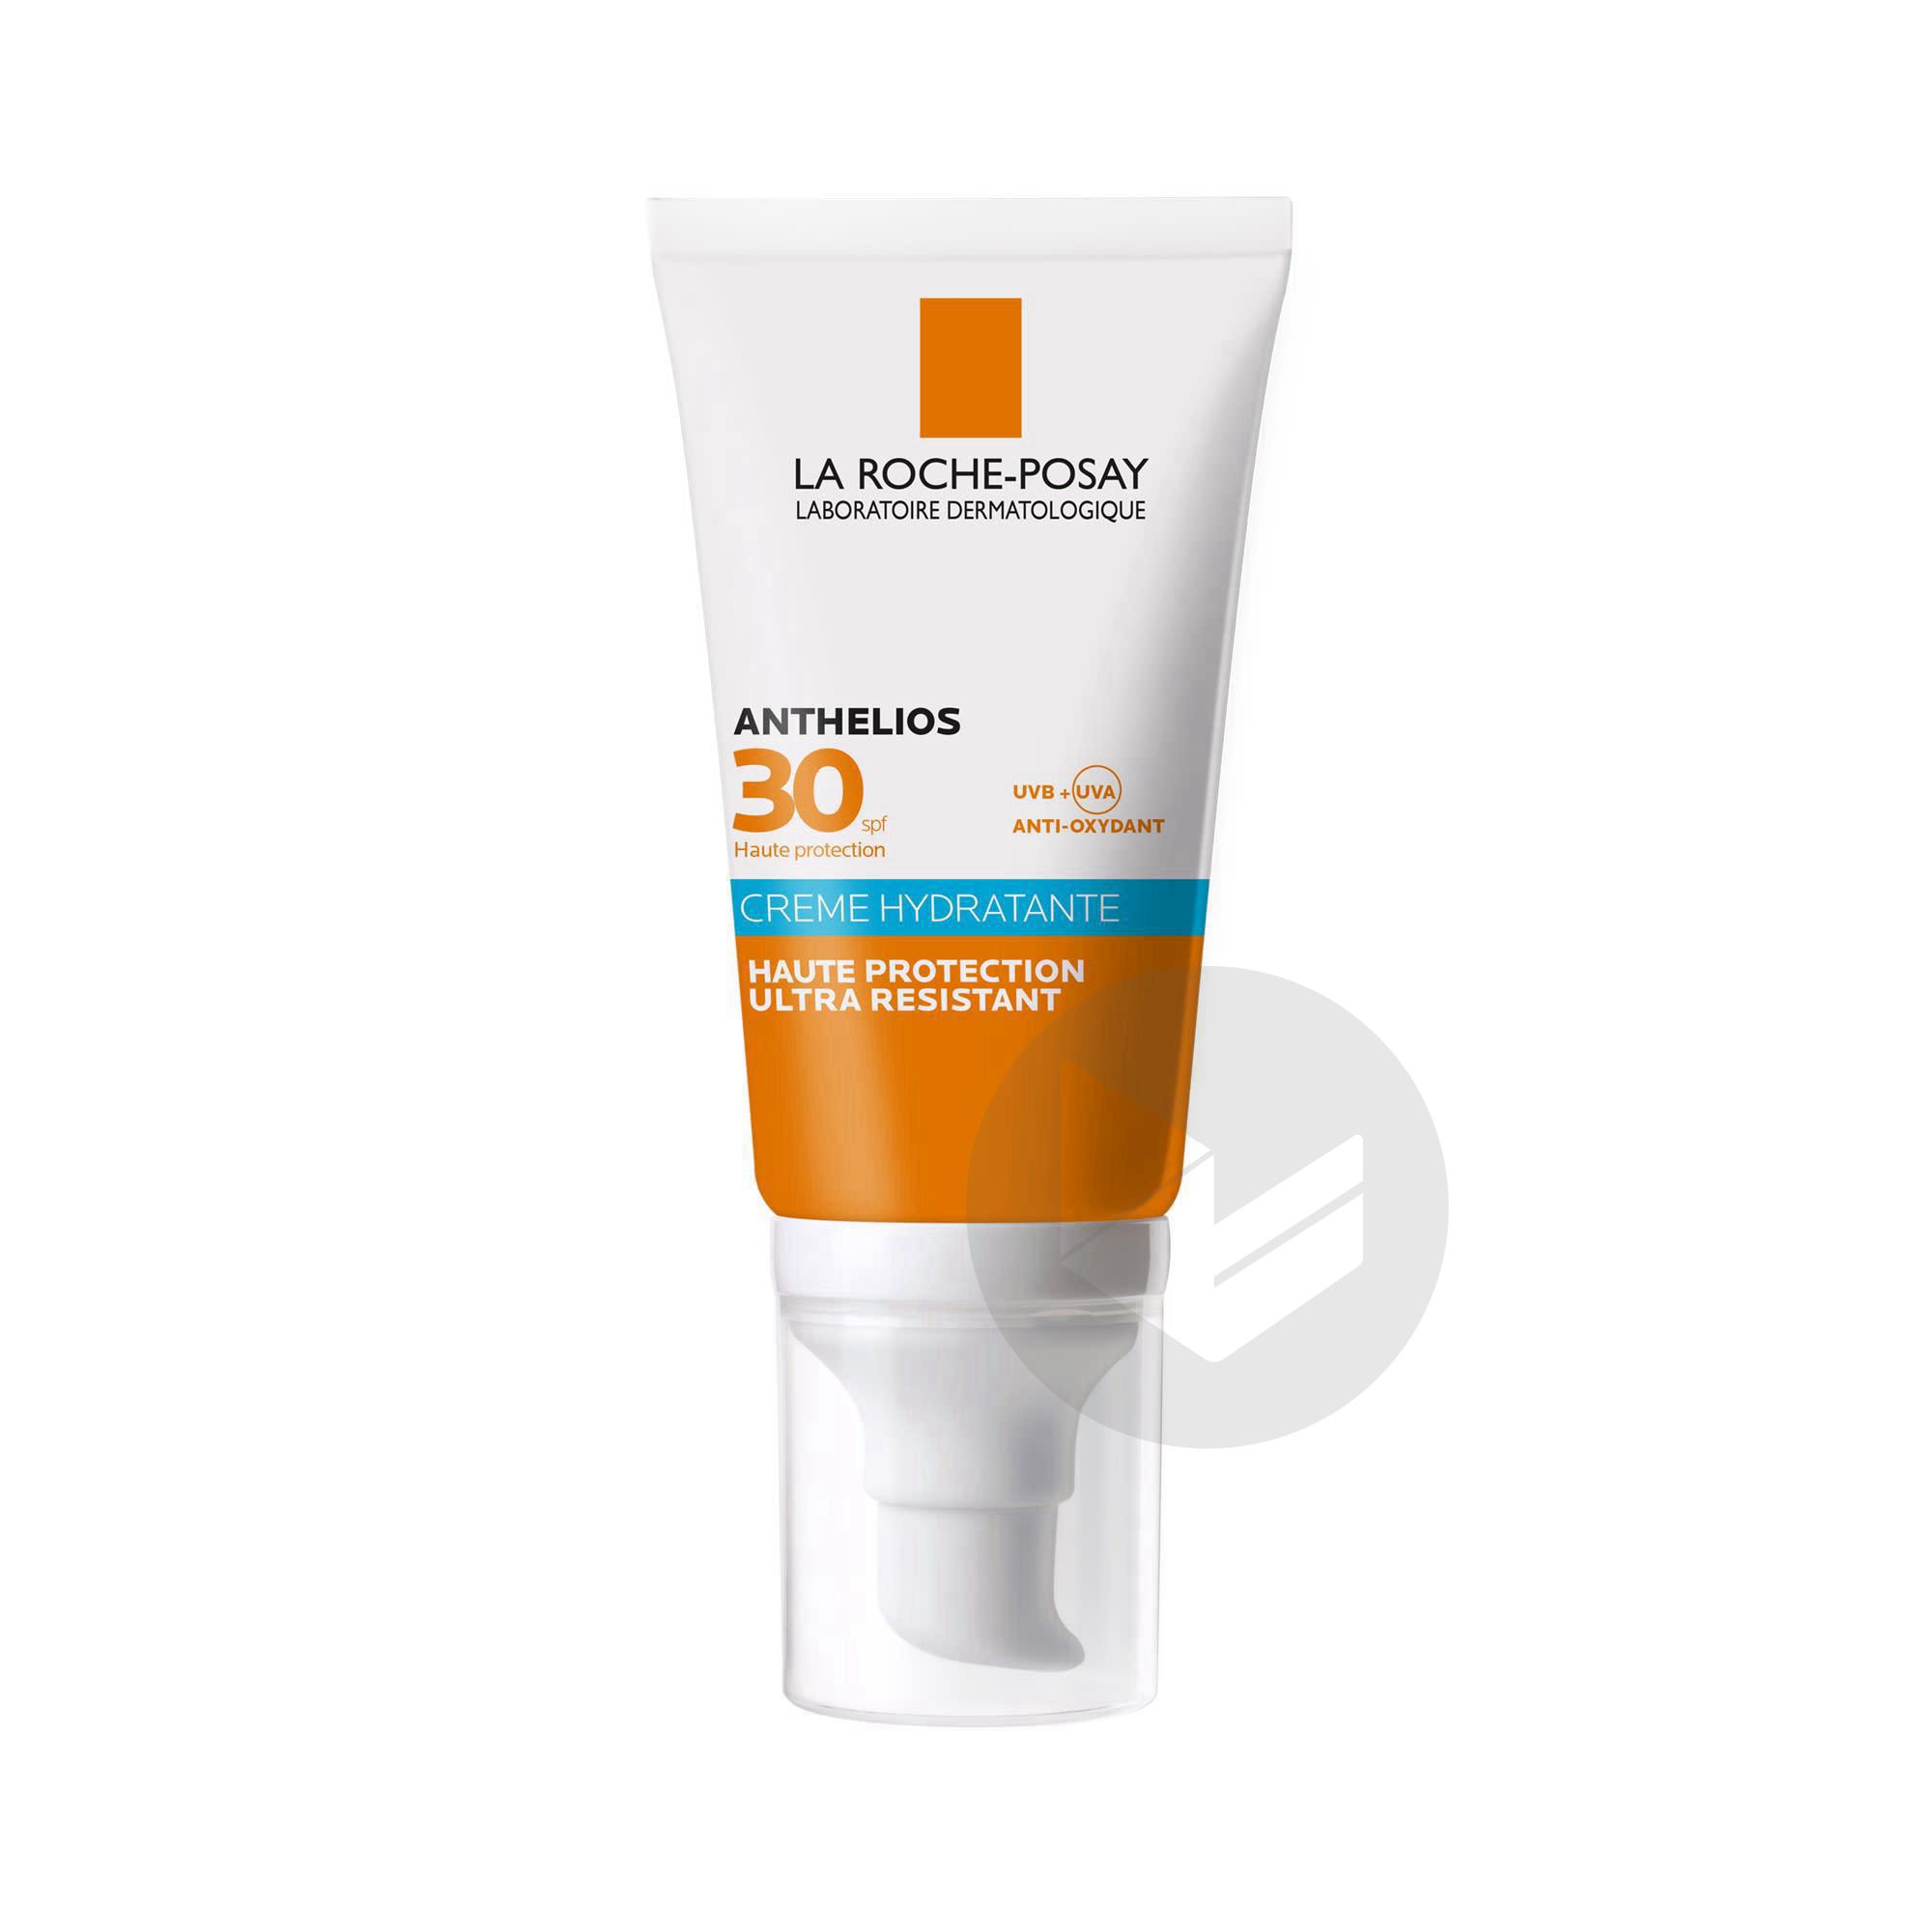 Anthelios Creme Solaire Hydratante Visage Spf 30 Avec Parfum 50 Ml